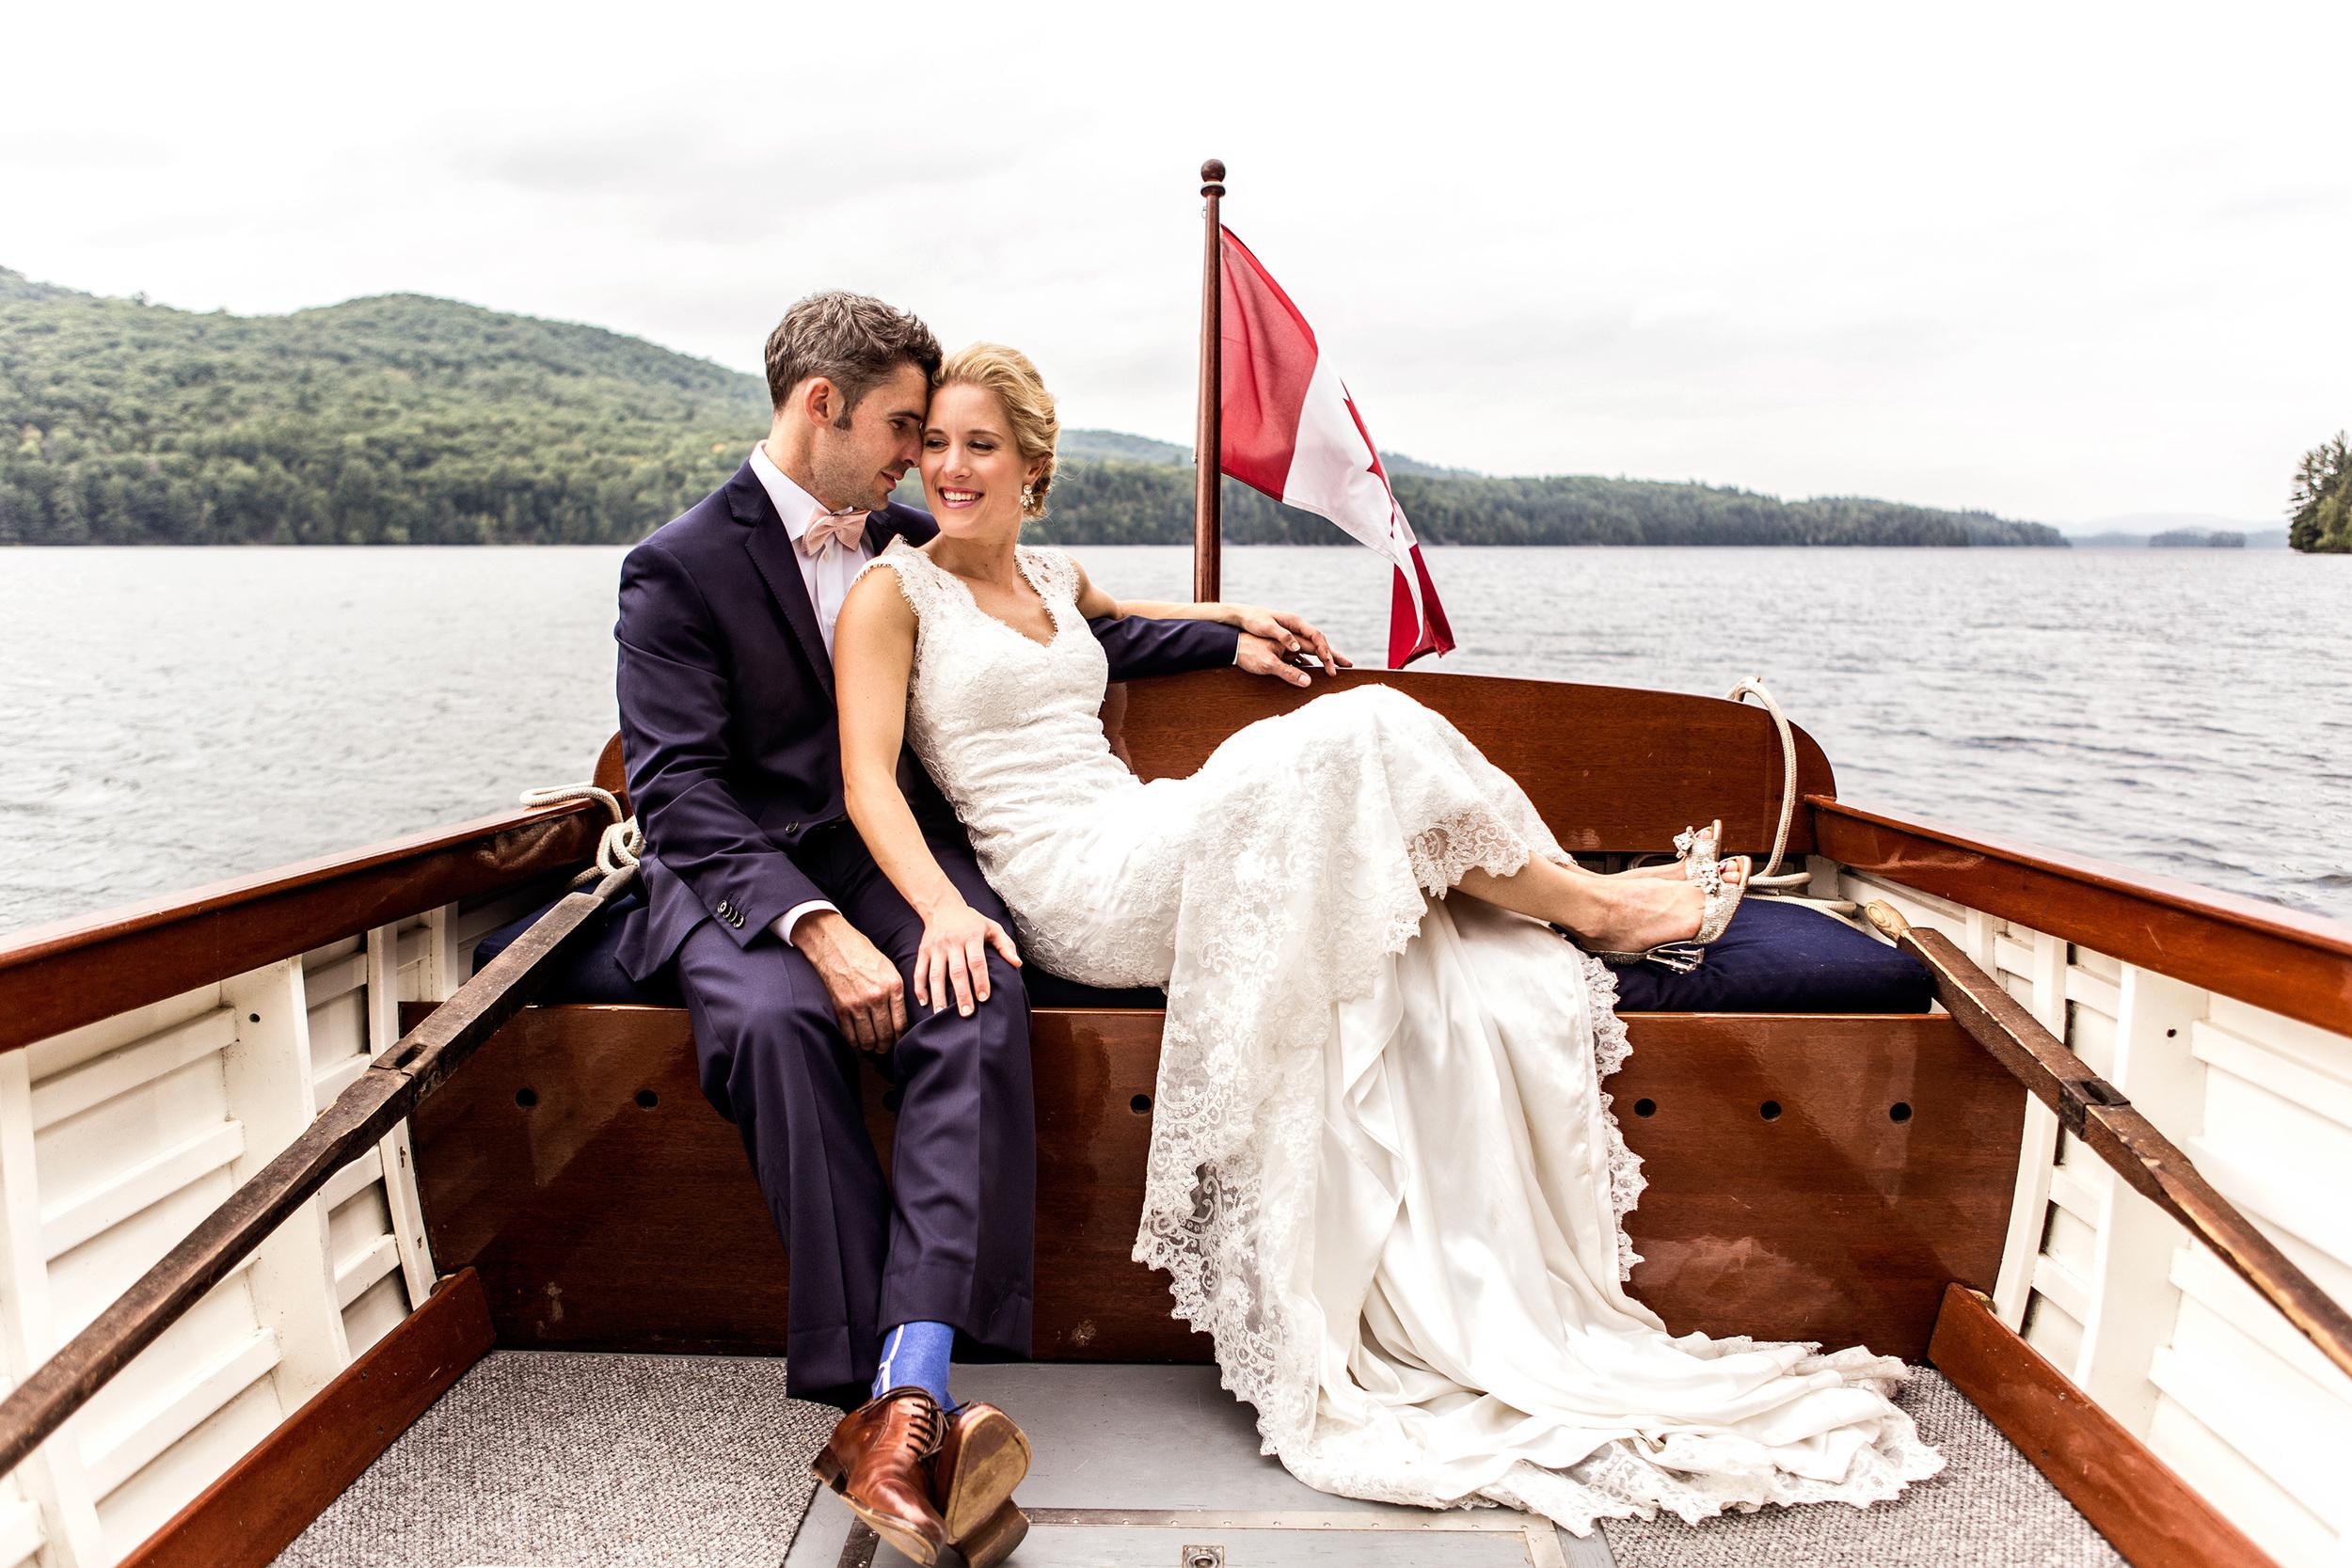 Cottage wedding portrait on a boat